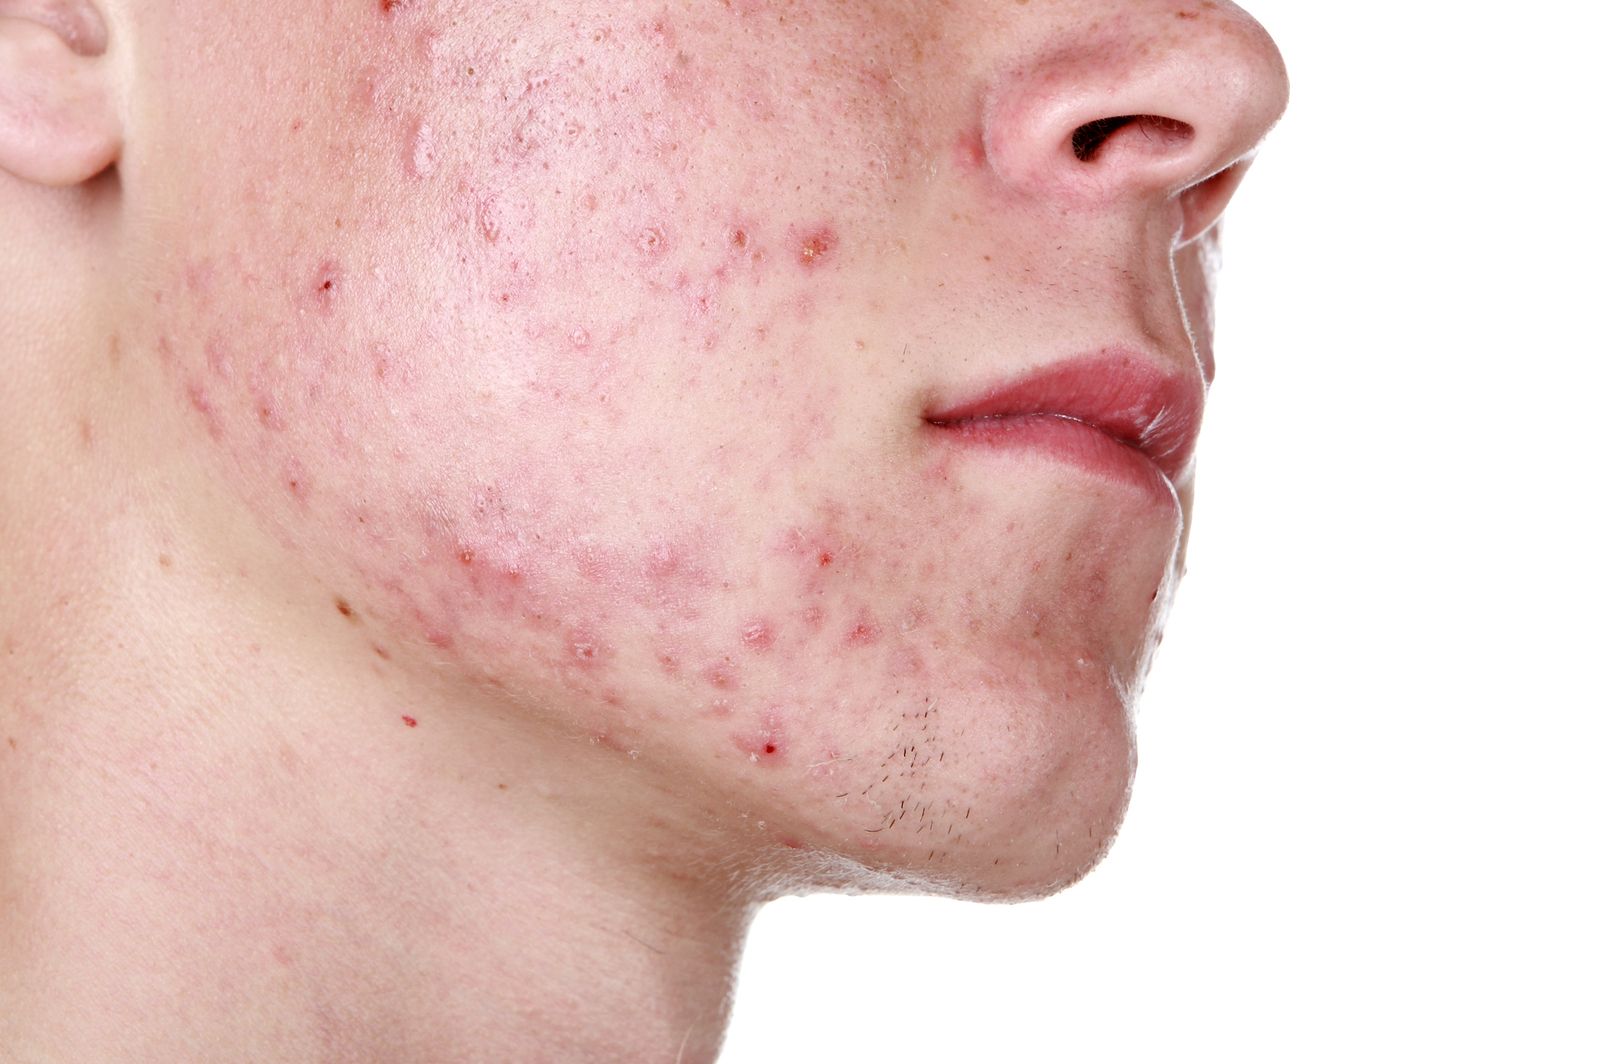 12 biztos jele annak, hogy parazita van a testedben | bacsbokodi-peca.hu